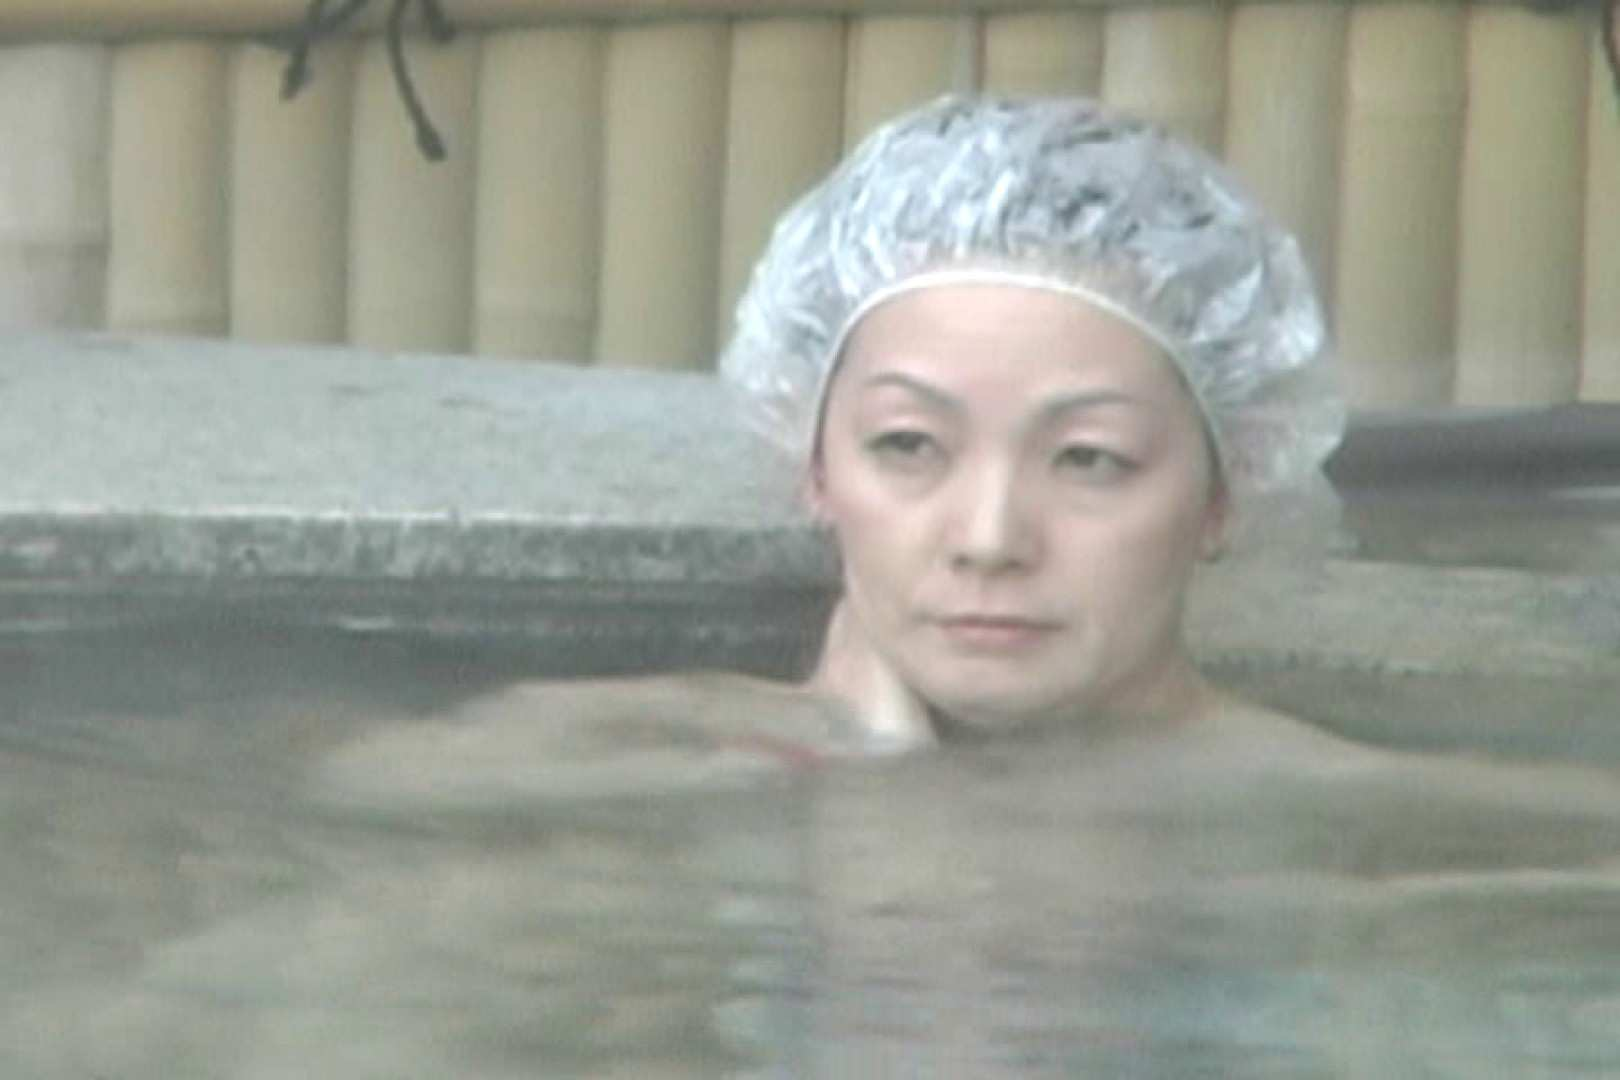 Aquaな露天風呂Vol.592 盗撮師作品  91pic 12